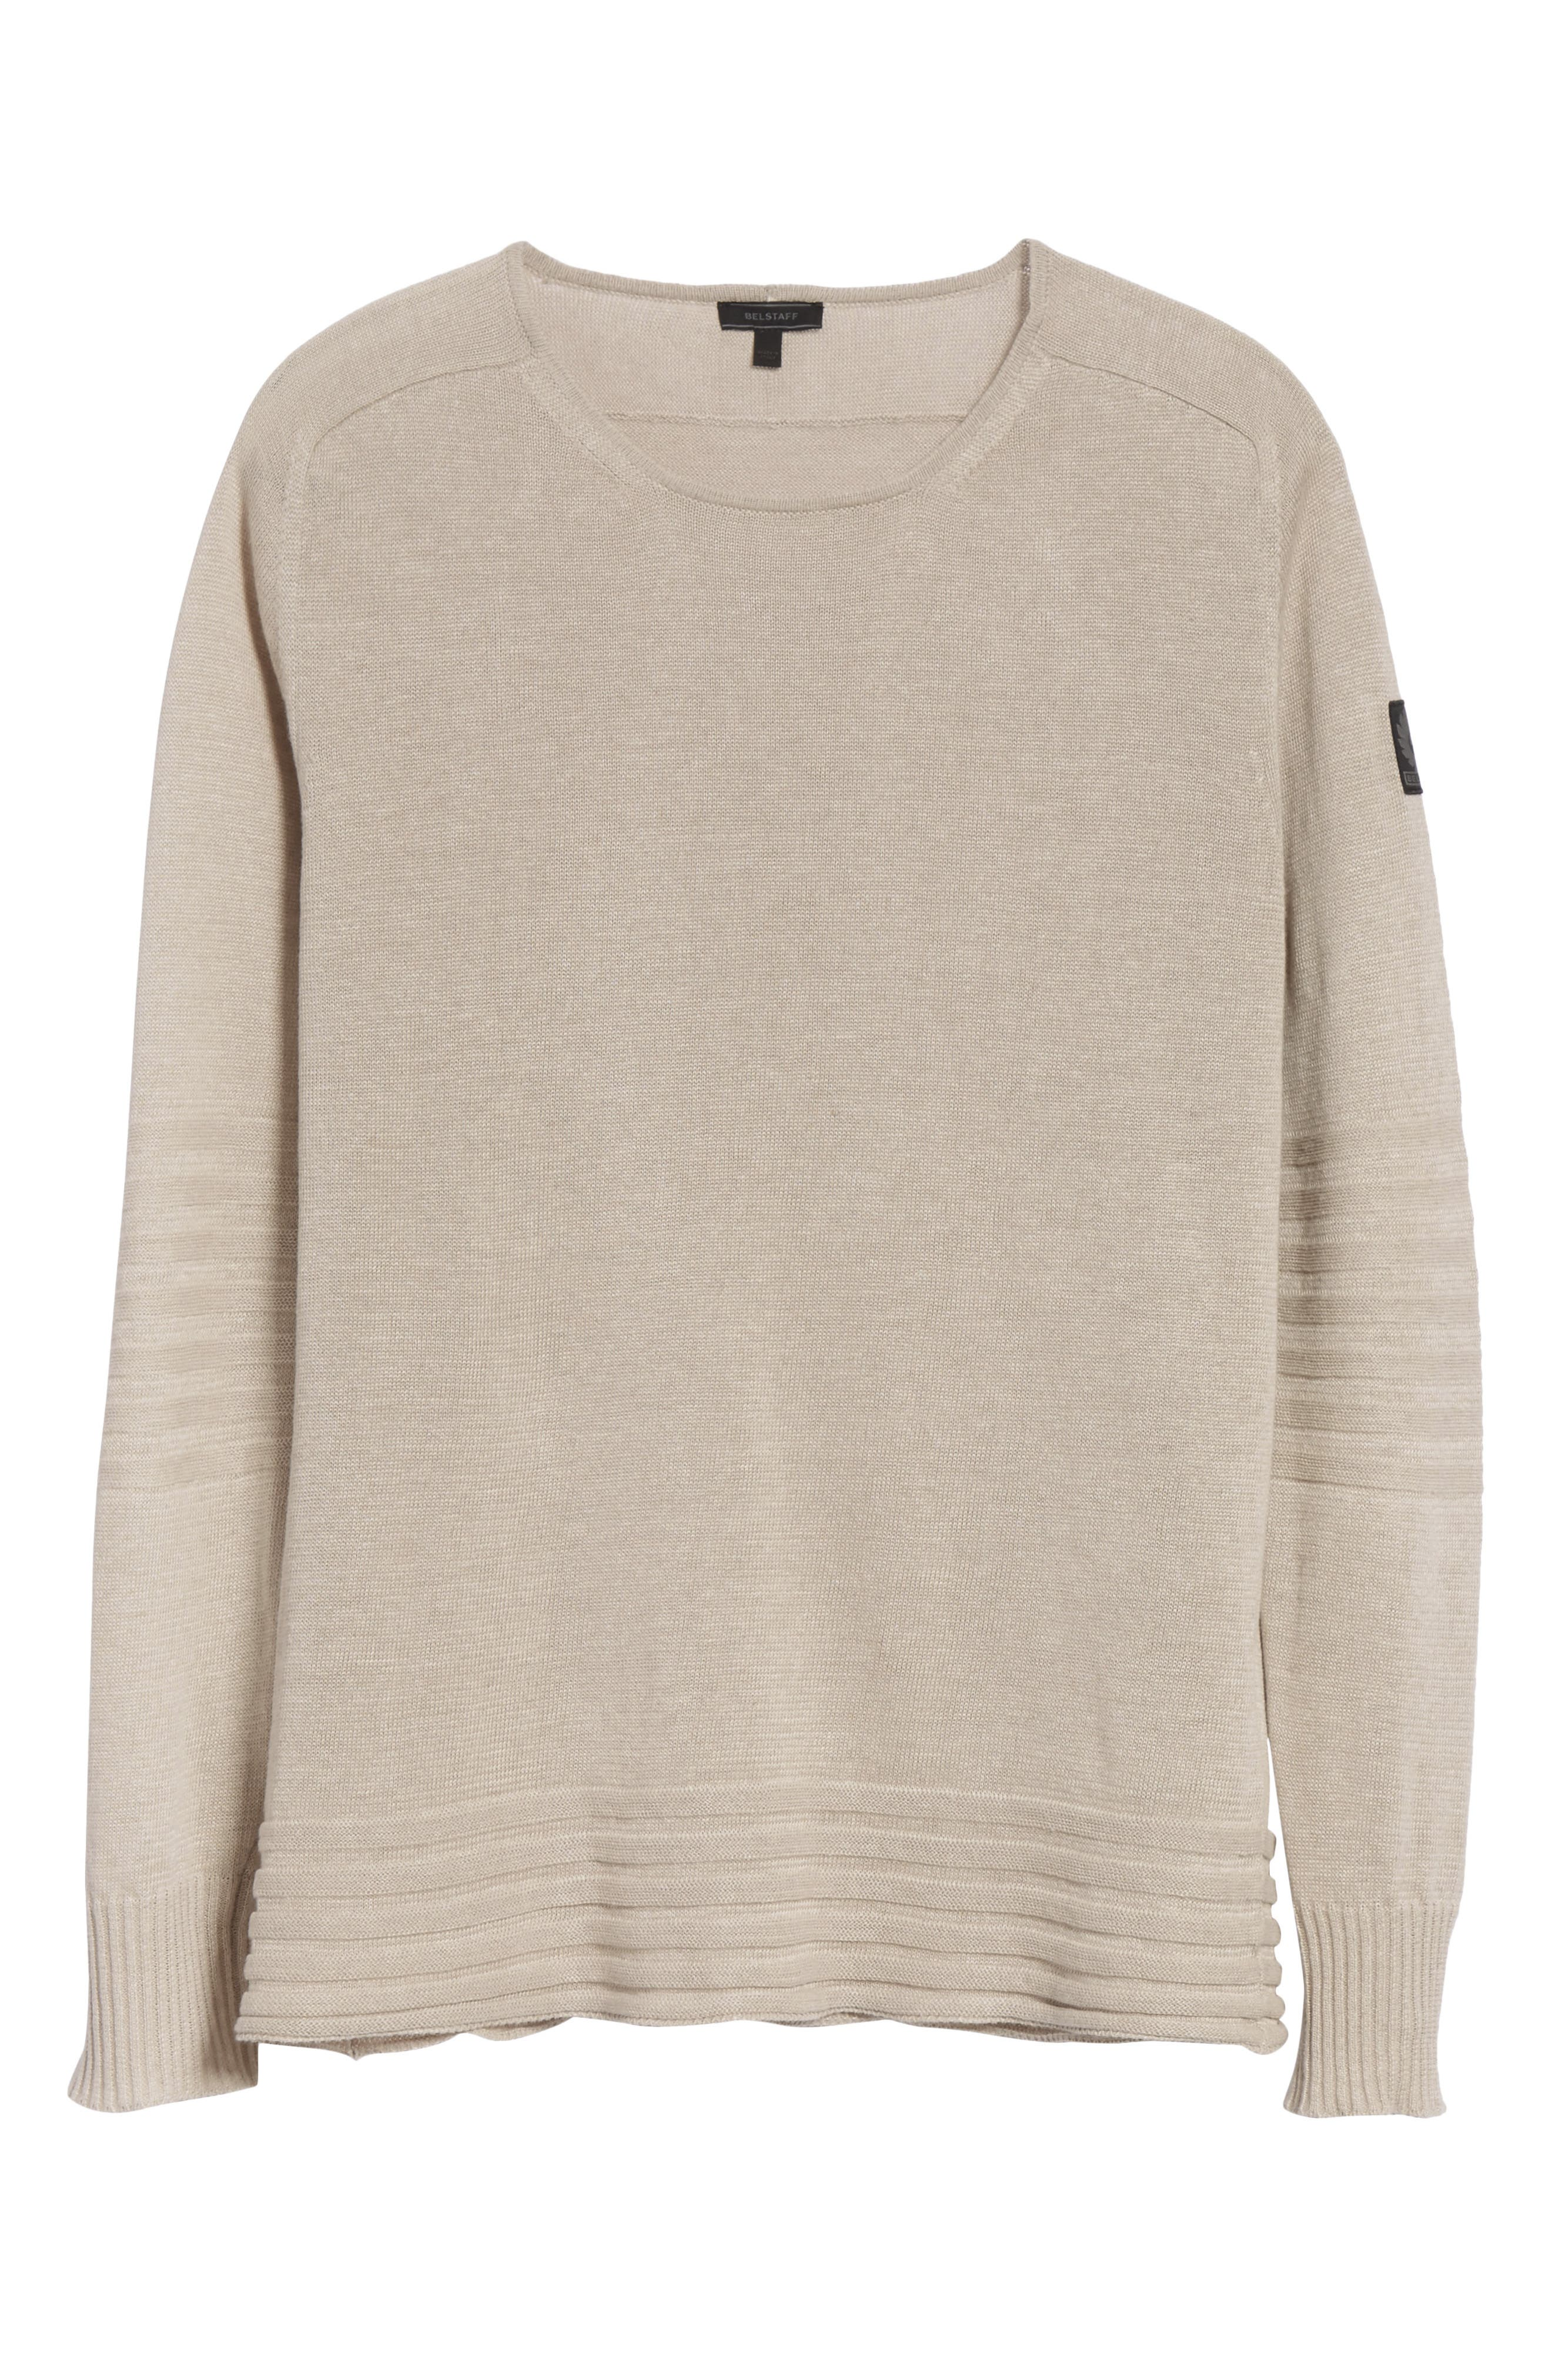 Exford Linen Crewneck Sweater,                             Alternate thumbnail 11, color,